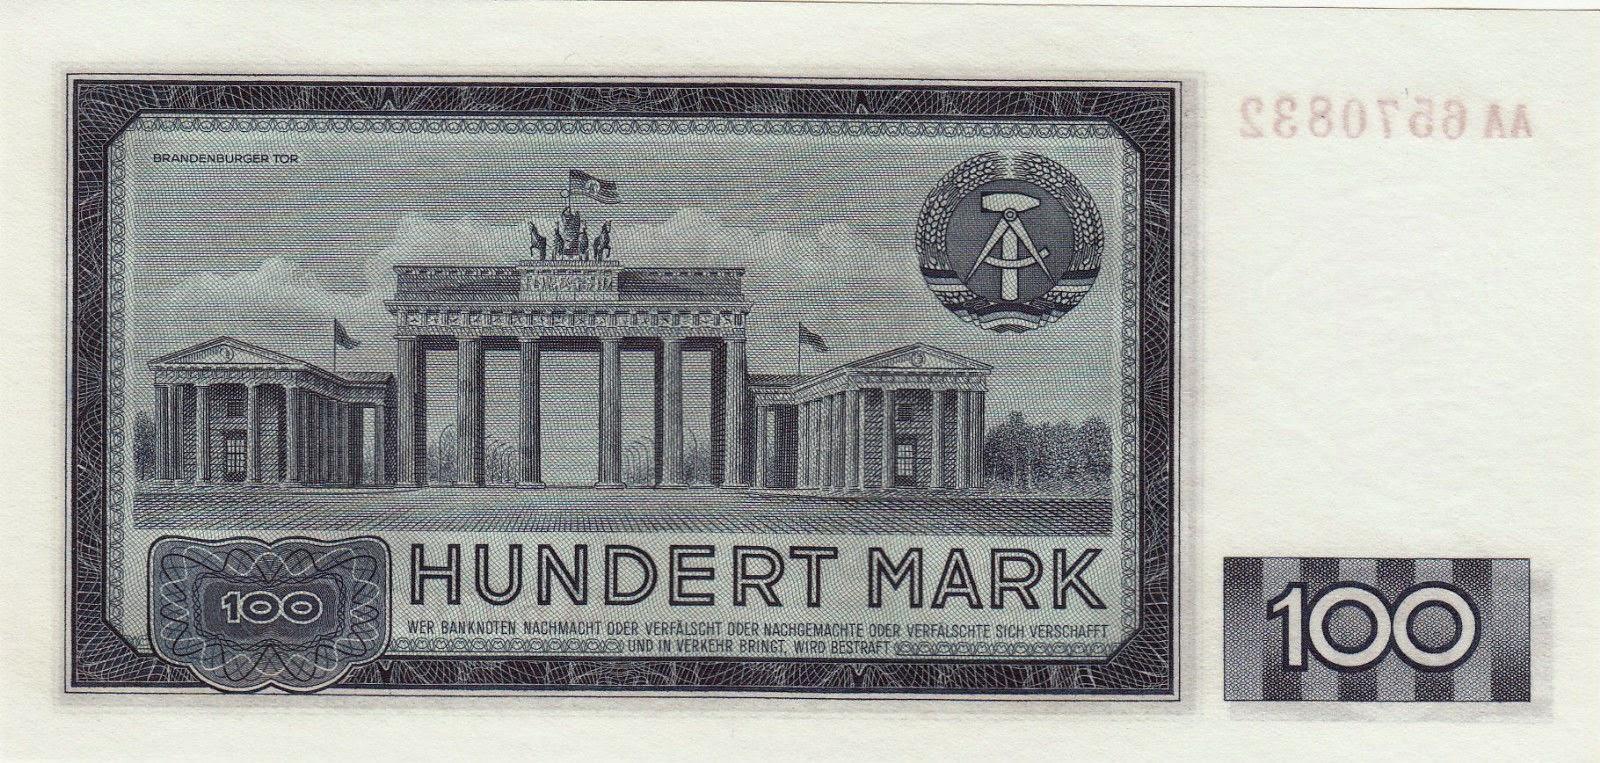 German Democratic Republic Banknotes 100 Mark banknote 1964 Brandenburg Gate in Berlin